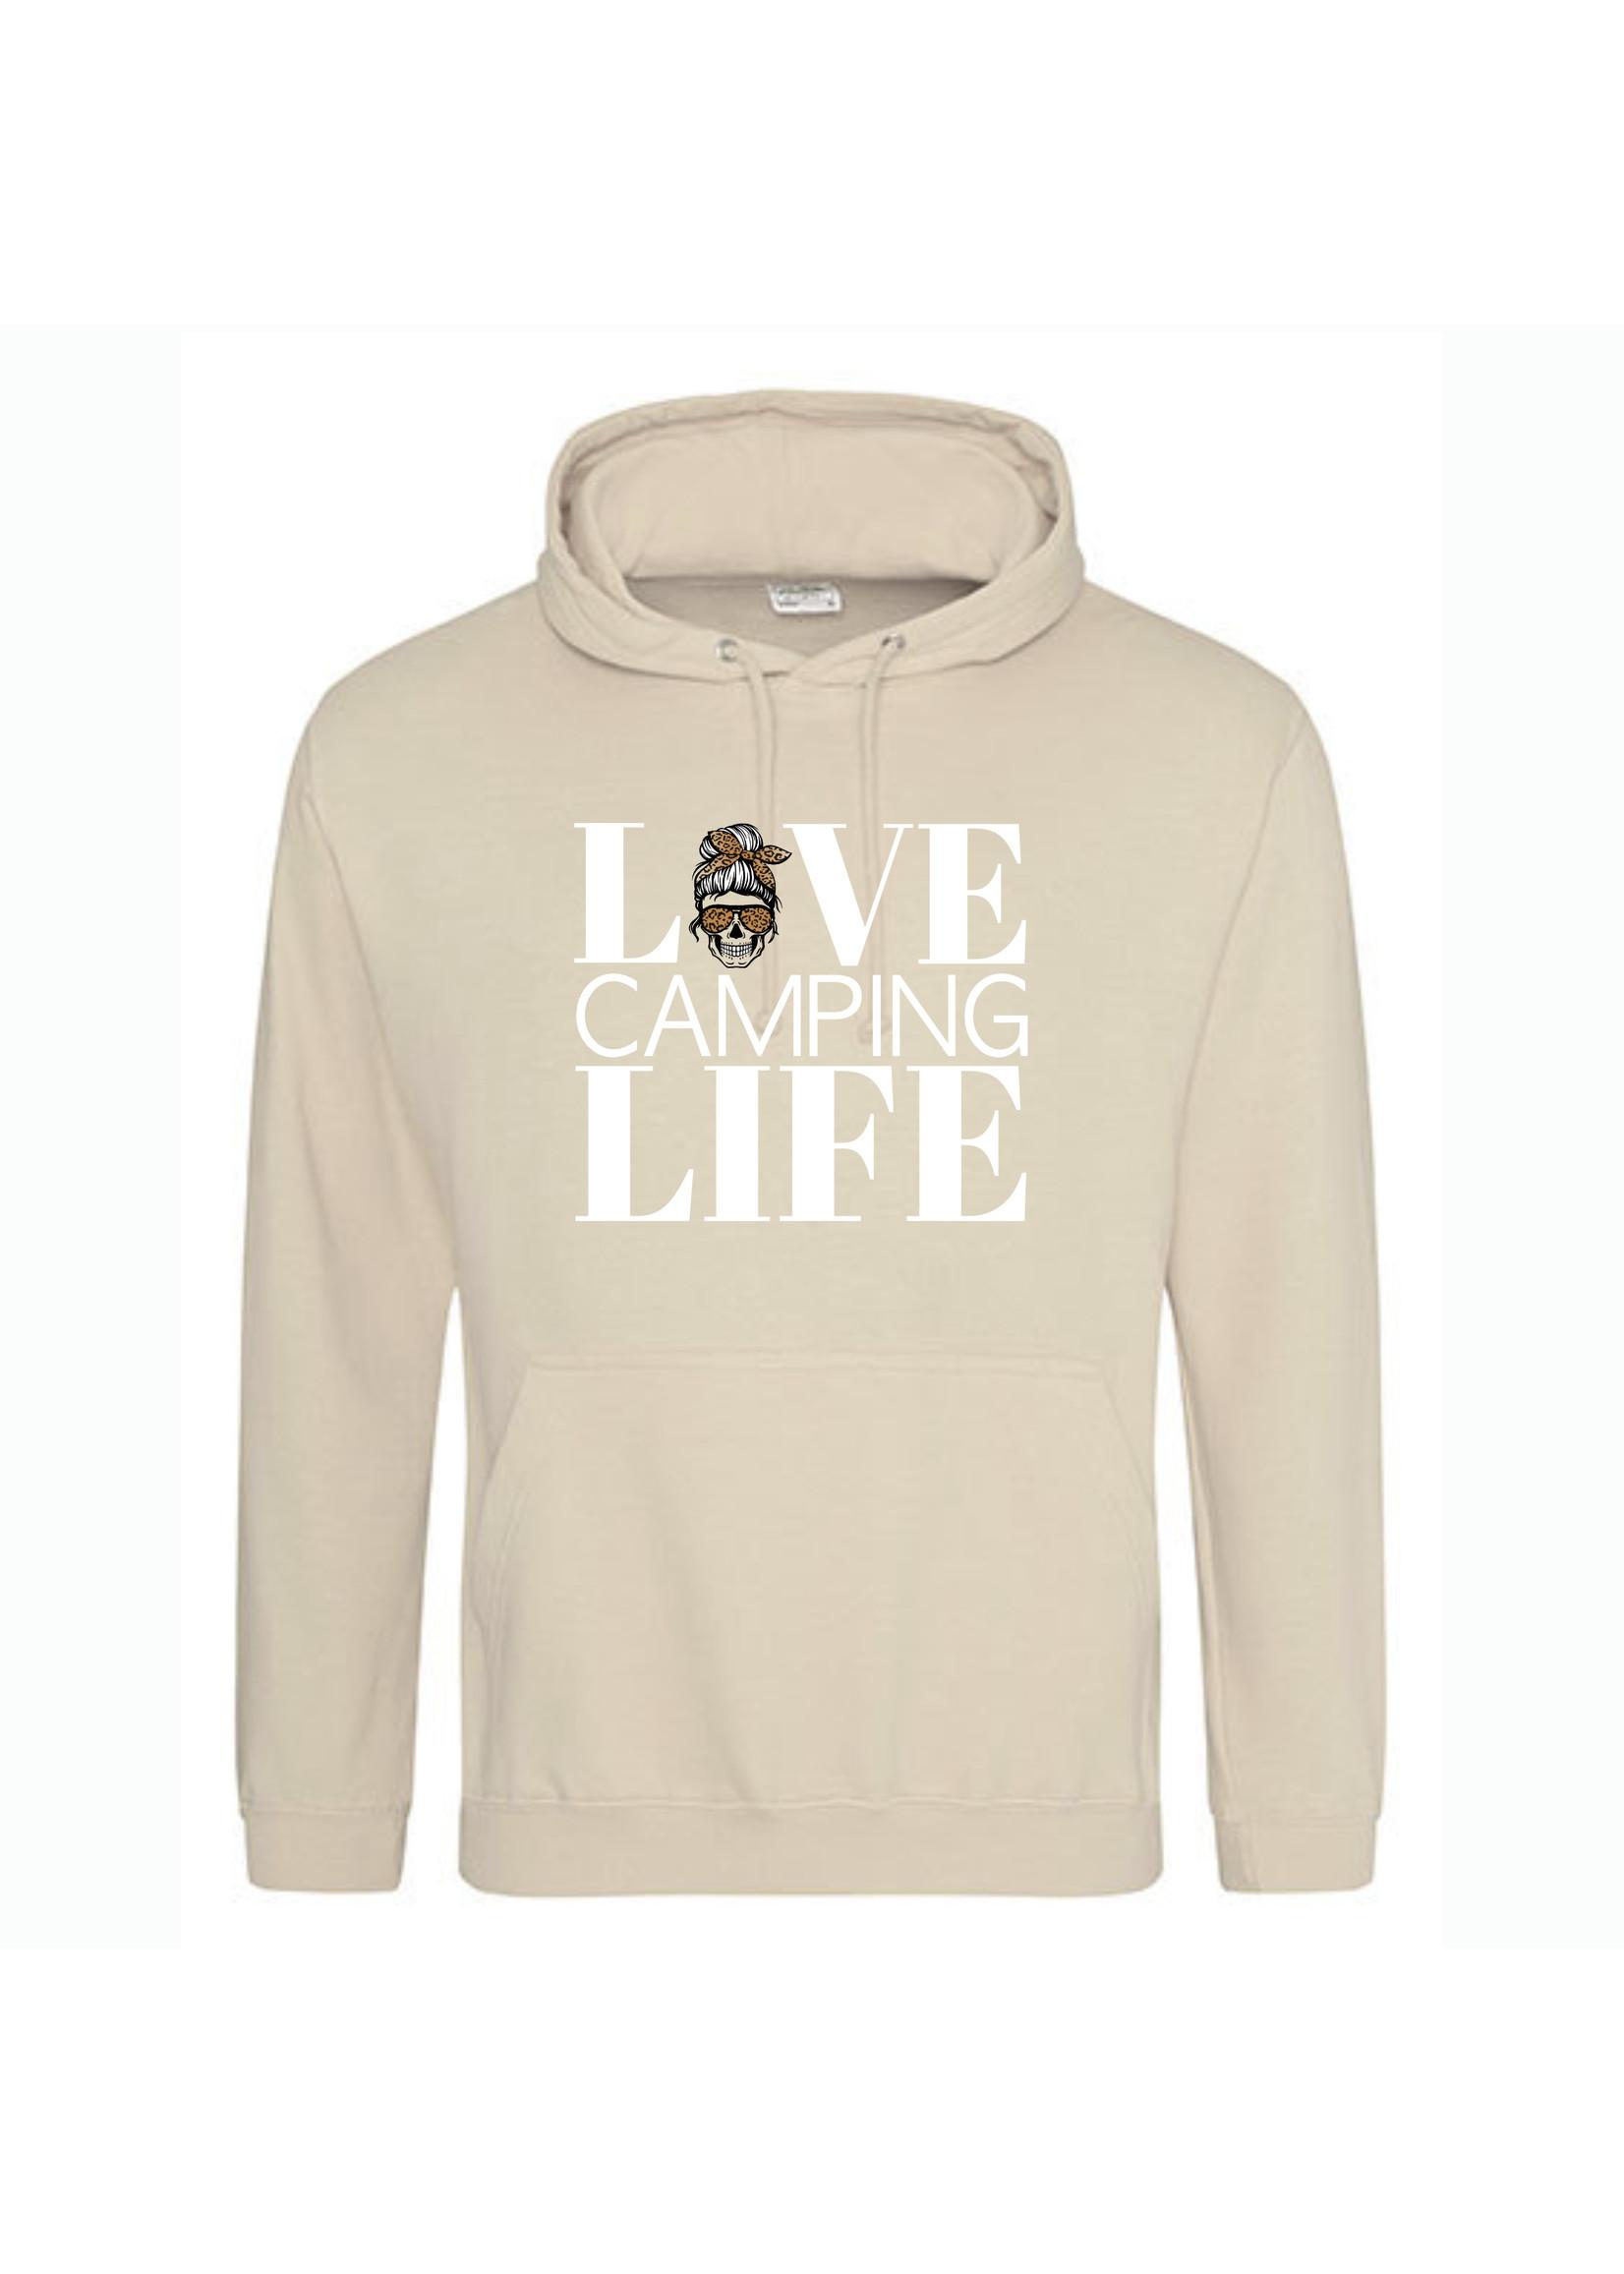 Love camping life mom hoodie